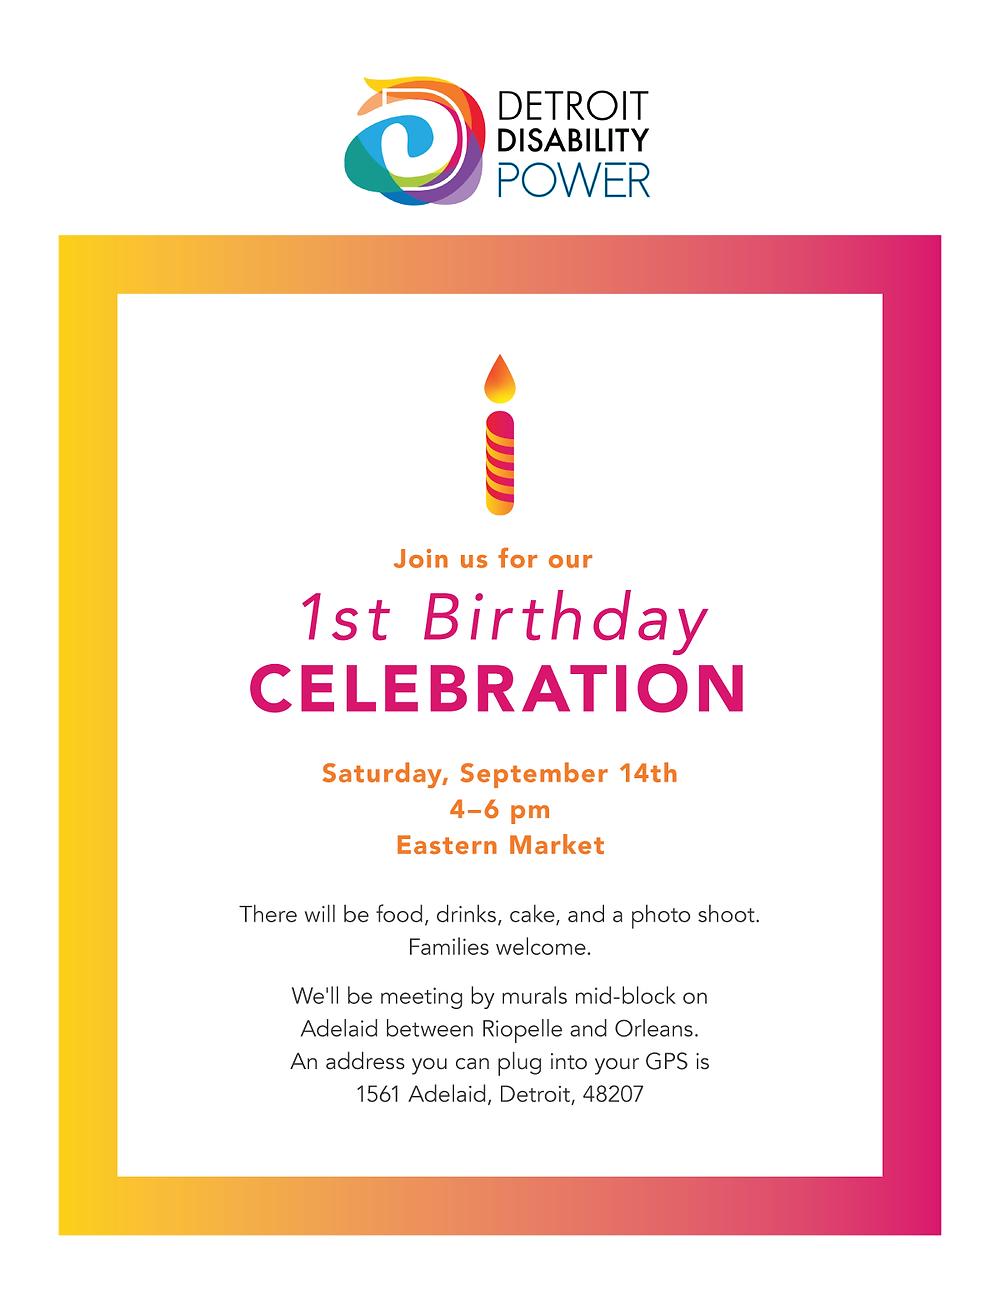 Detroit Disability Power's 1st Birthday Celebration flyer